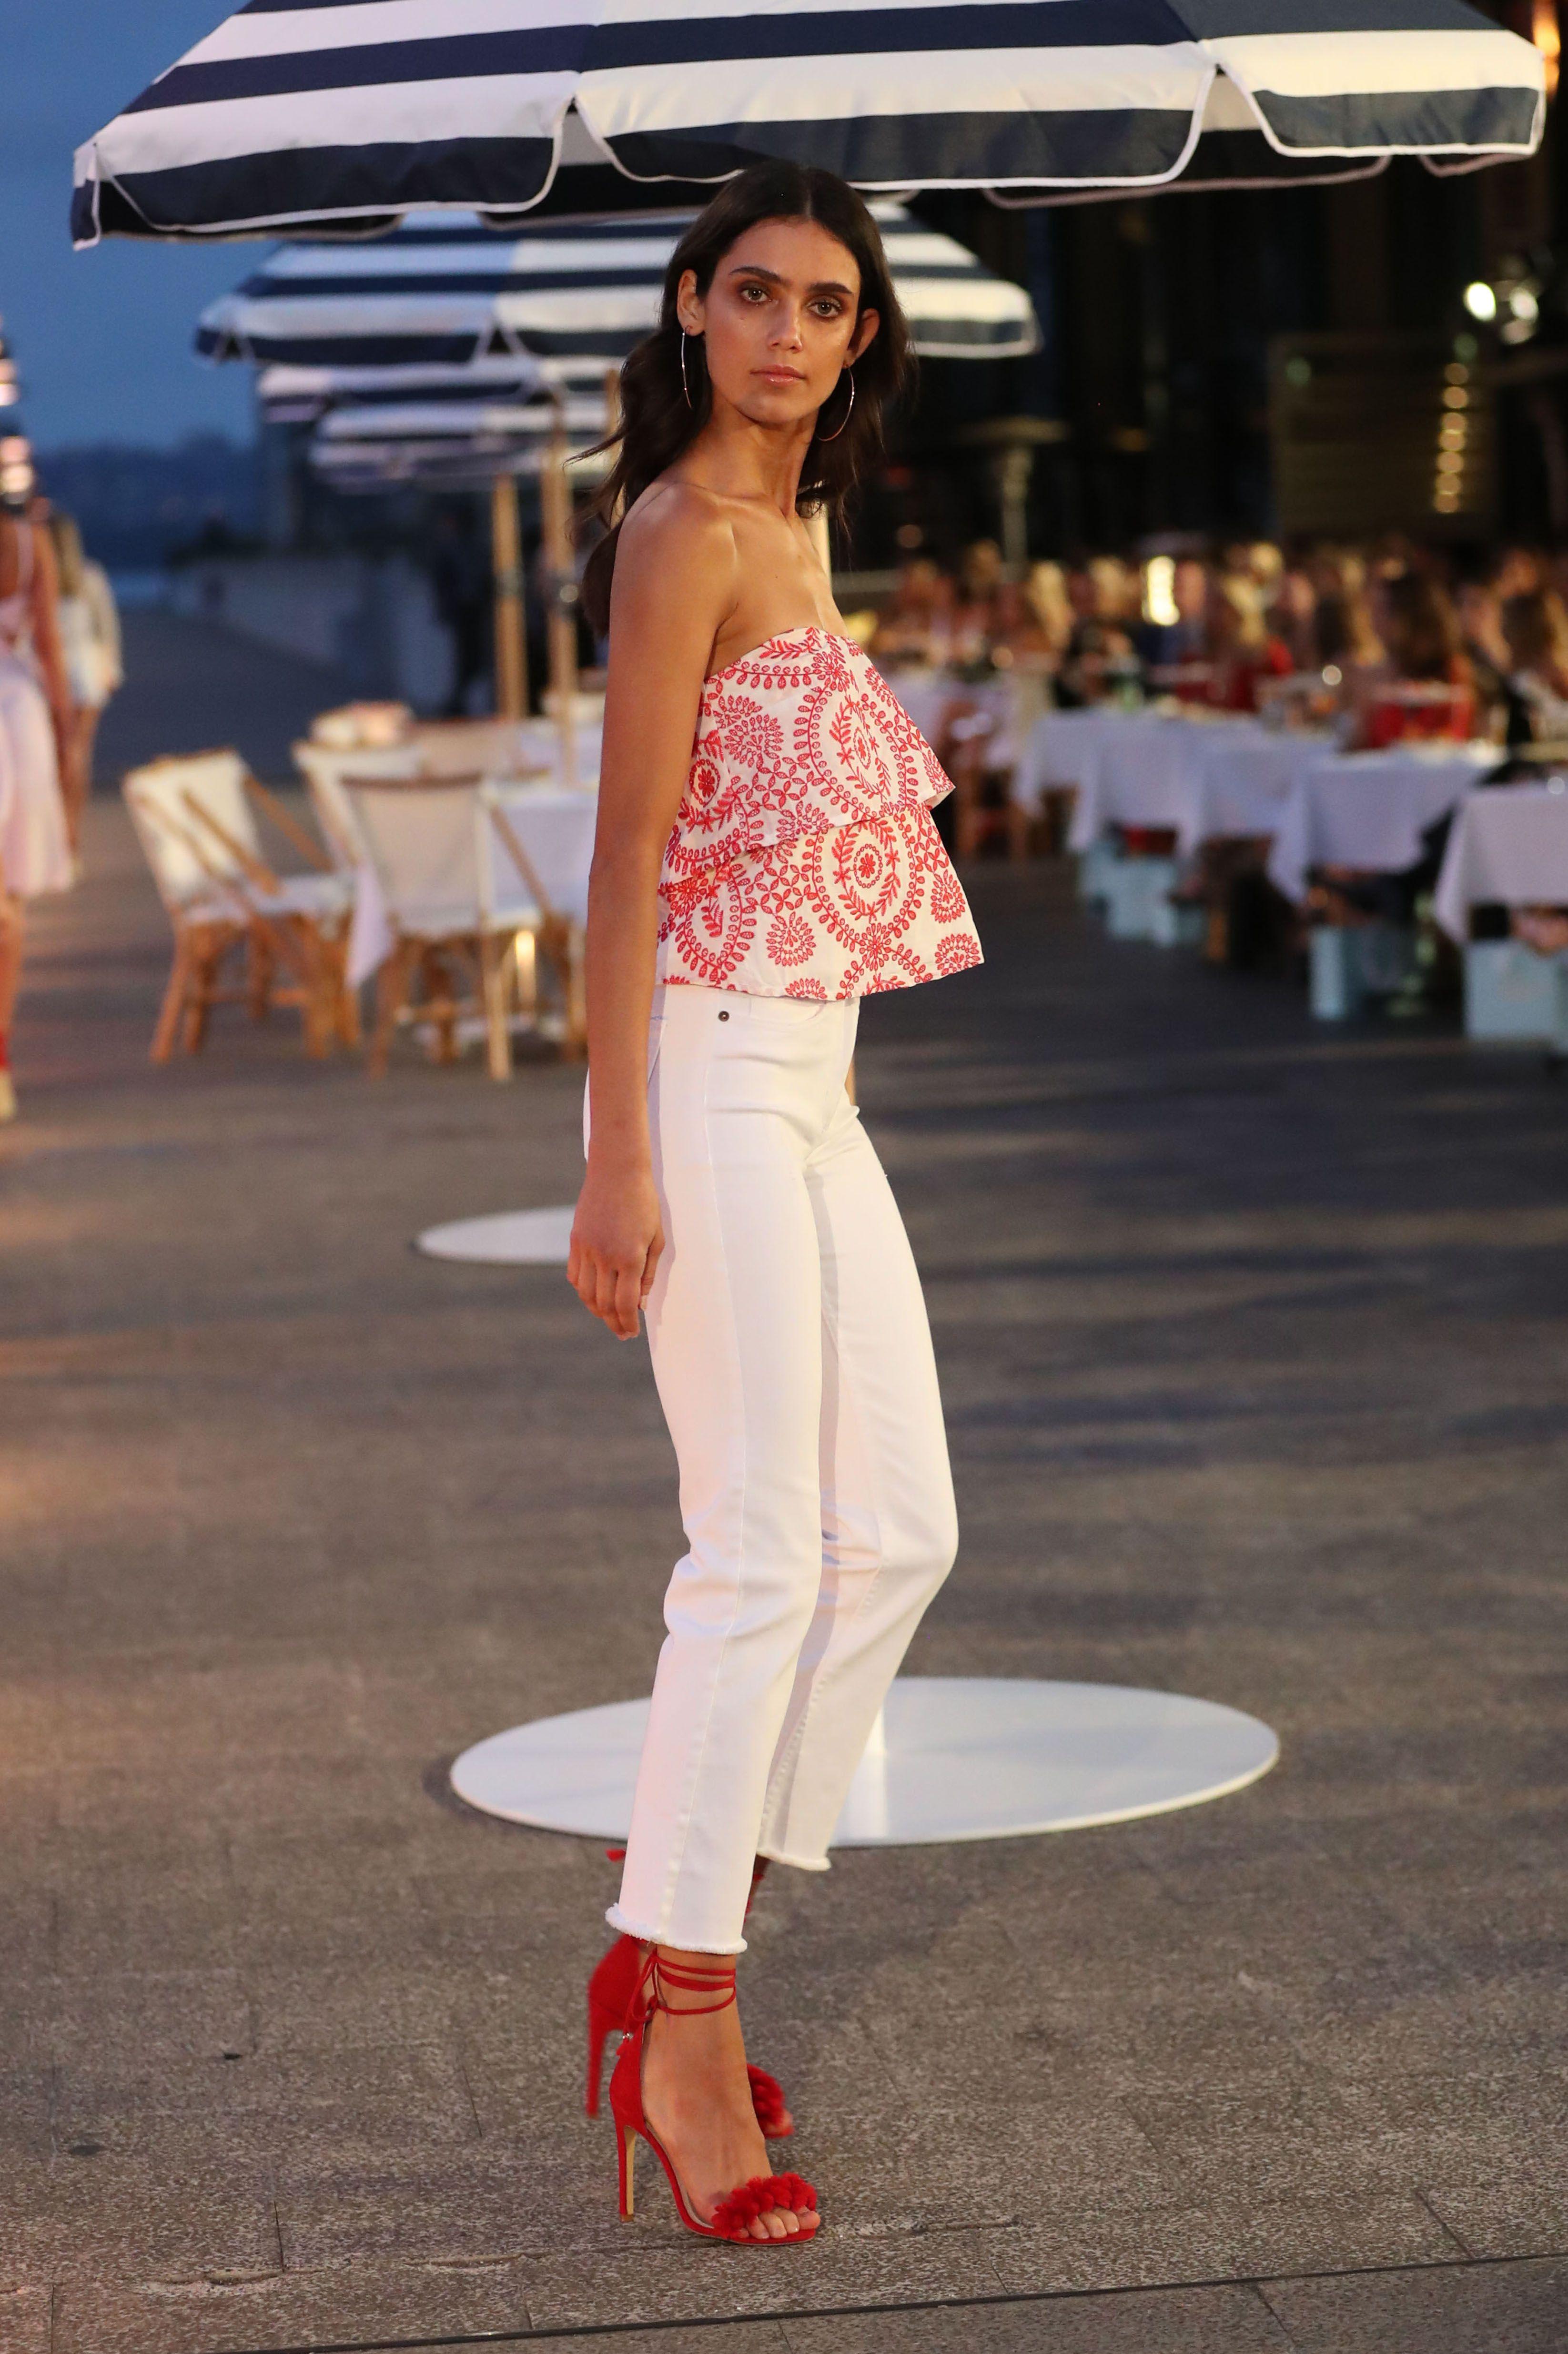 f94fd72c099 Kookai Rozalia Top | Isle Of Kookai Runway Show in 2019 | Fashion ...